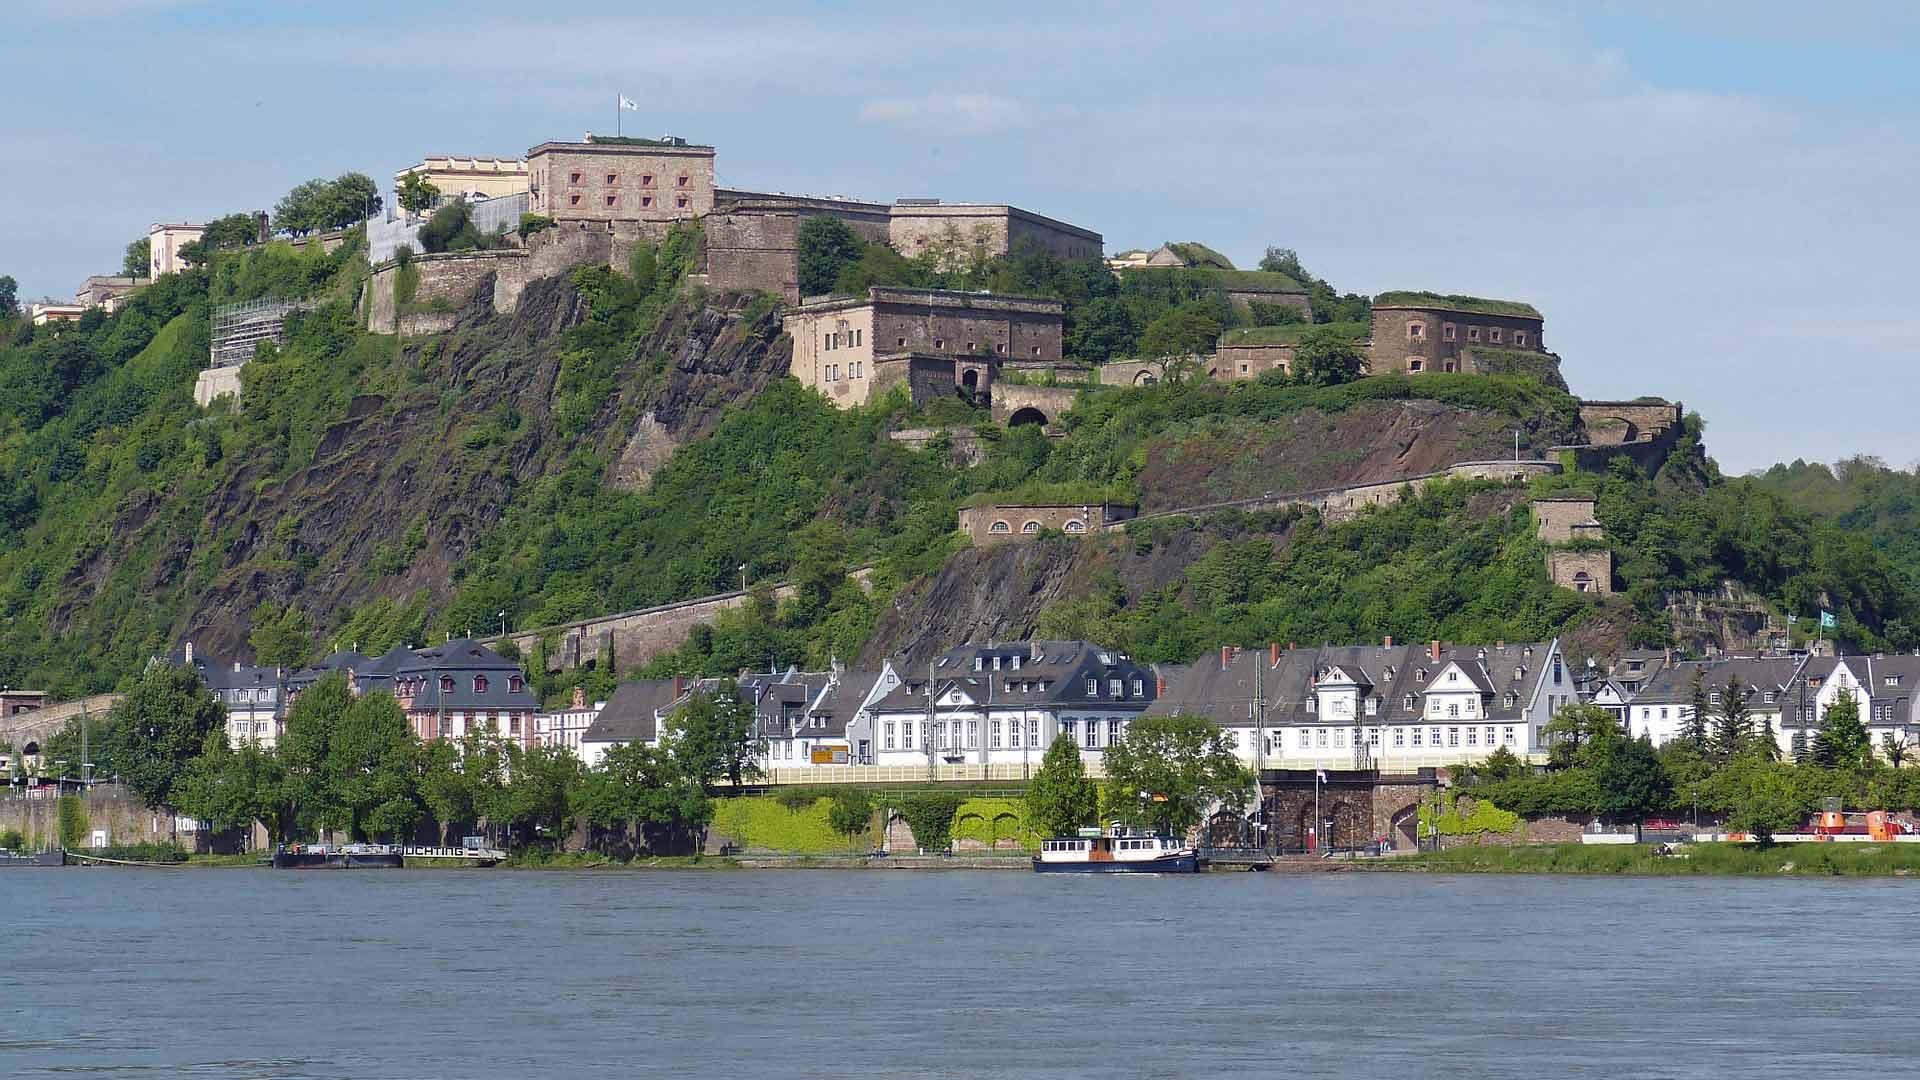 Vesting Ehrenbreitstein in Koblenz zie je al van veraf liggen.